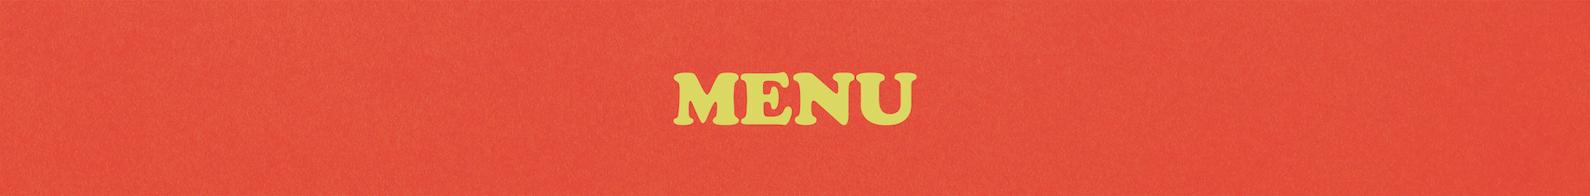 menu title.png